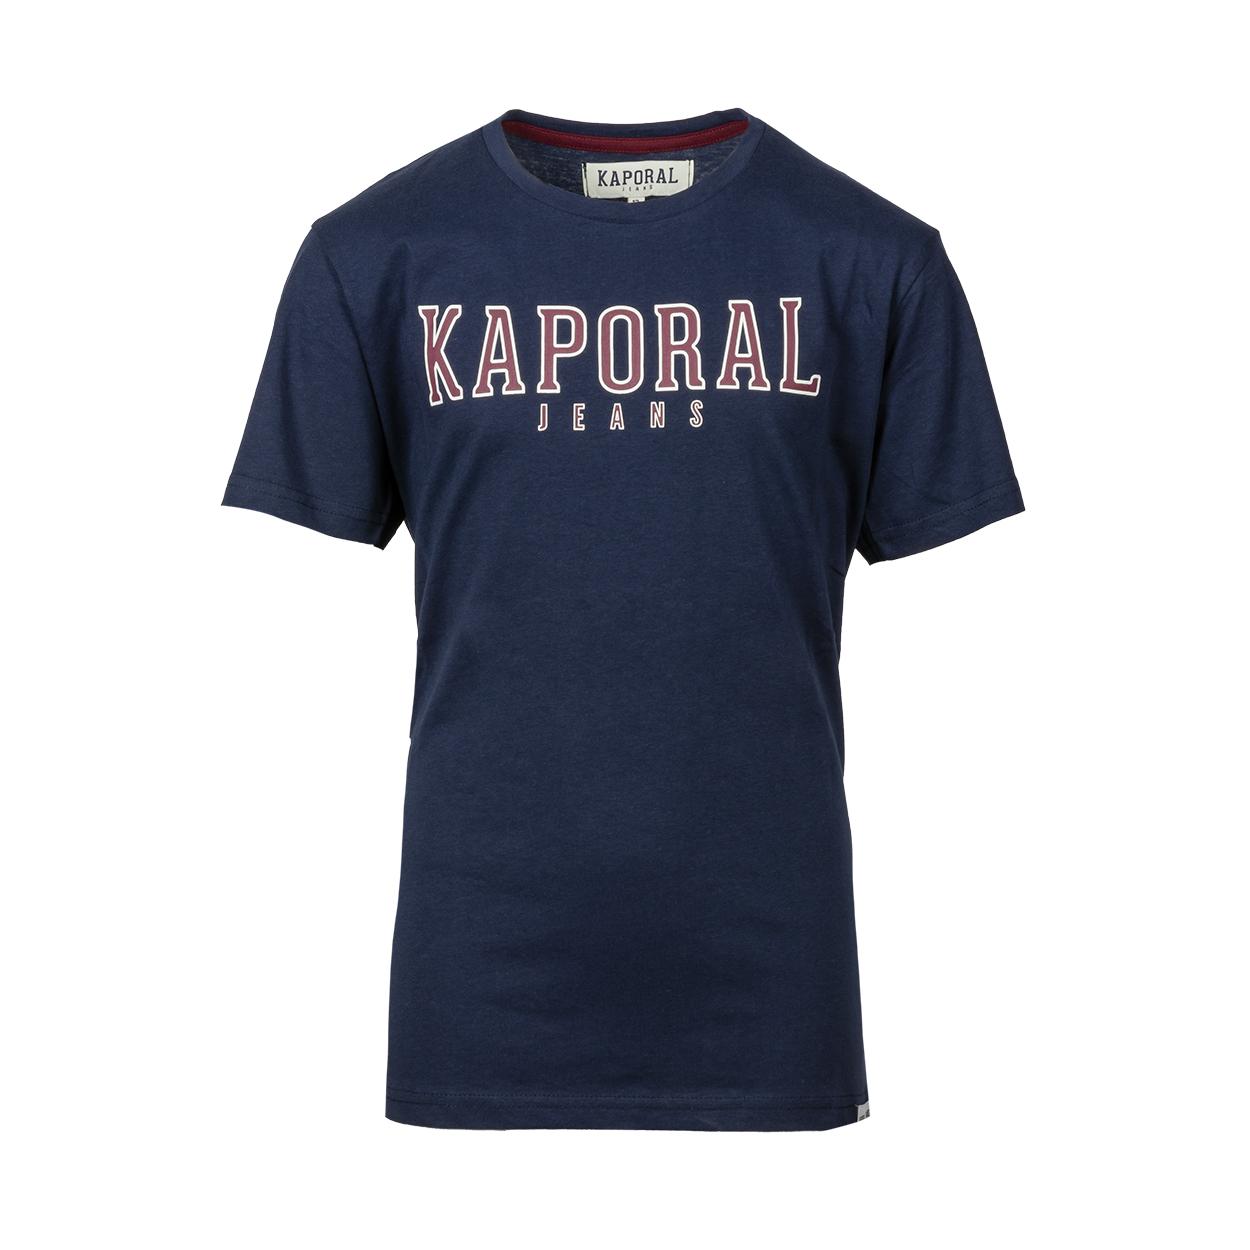 Tee-shirt col rond  orad en coton bleu marine floqué en rouge